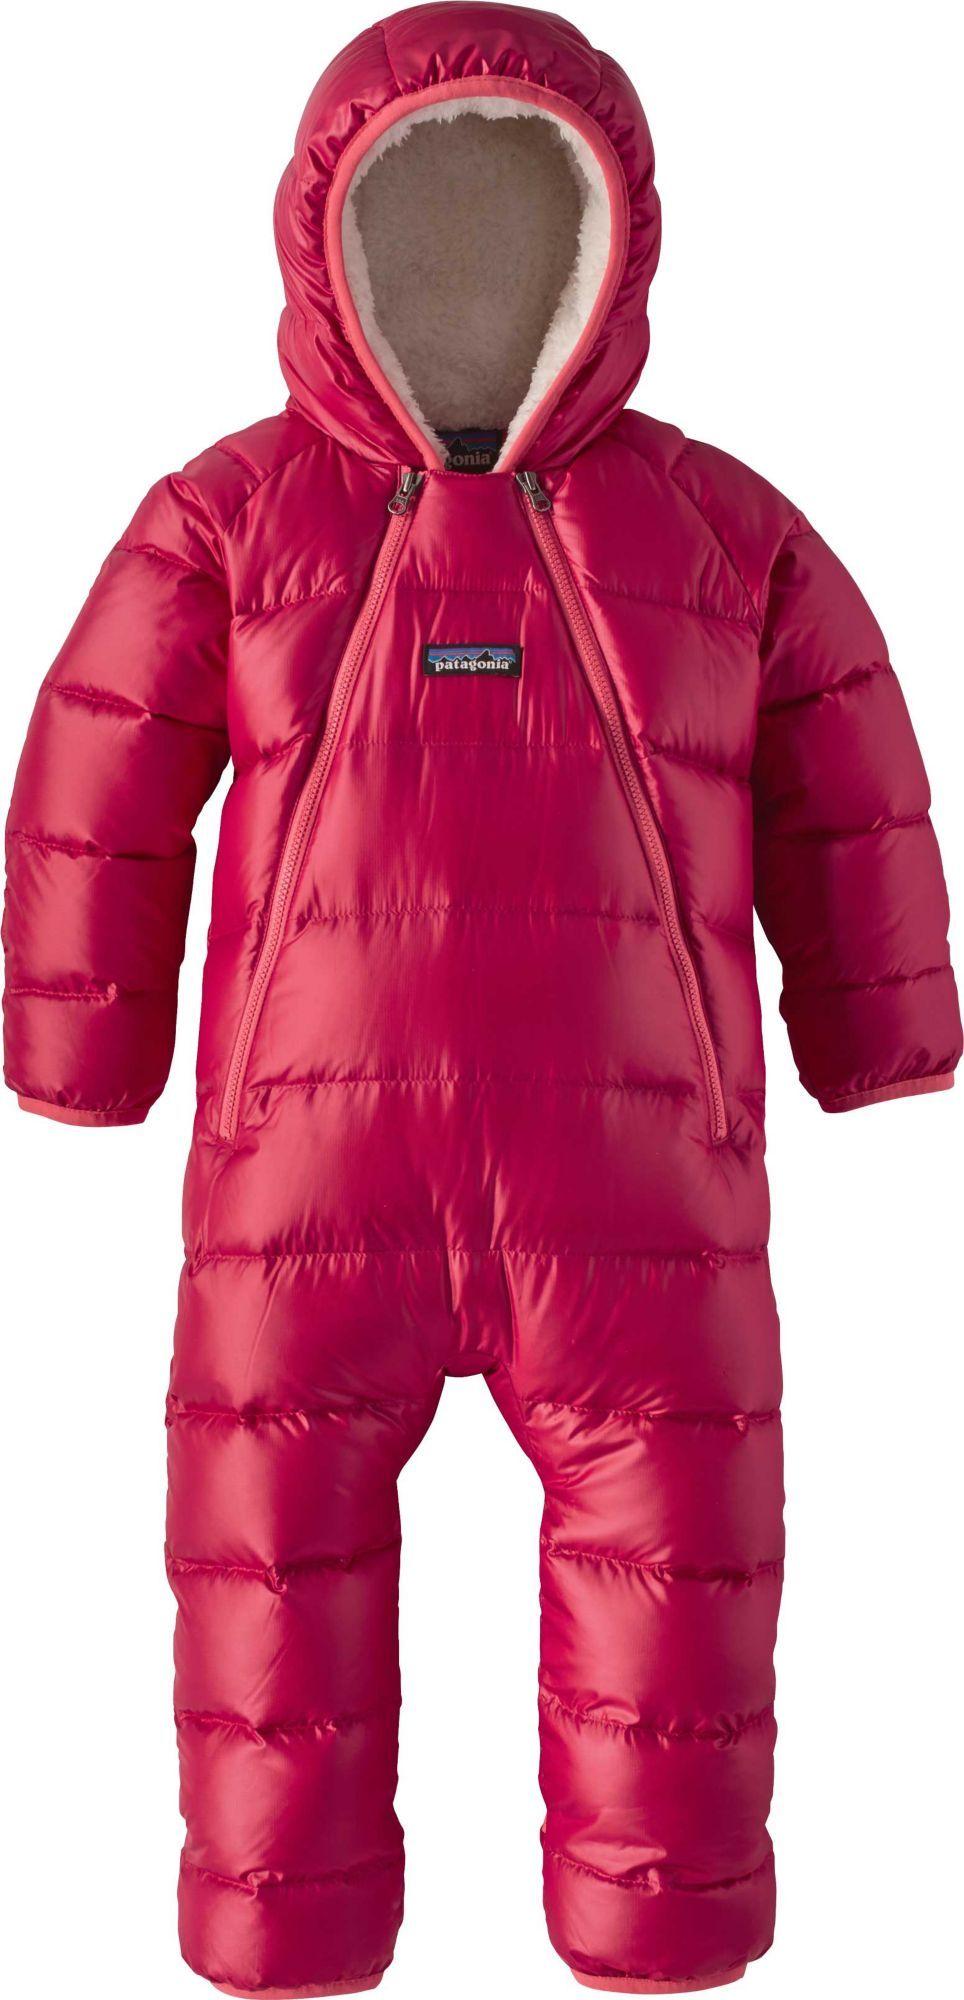 1fcd10f03 Patagonia Infant Girls  Hi-Loft Down Sweater Bunting